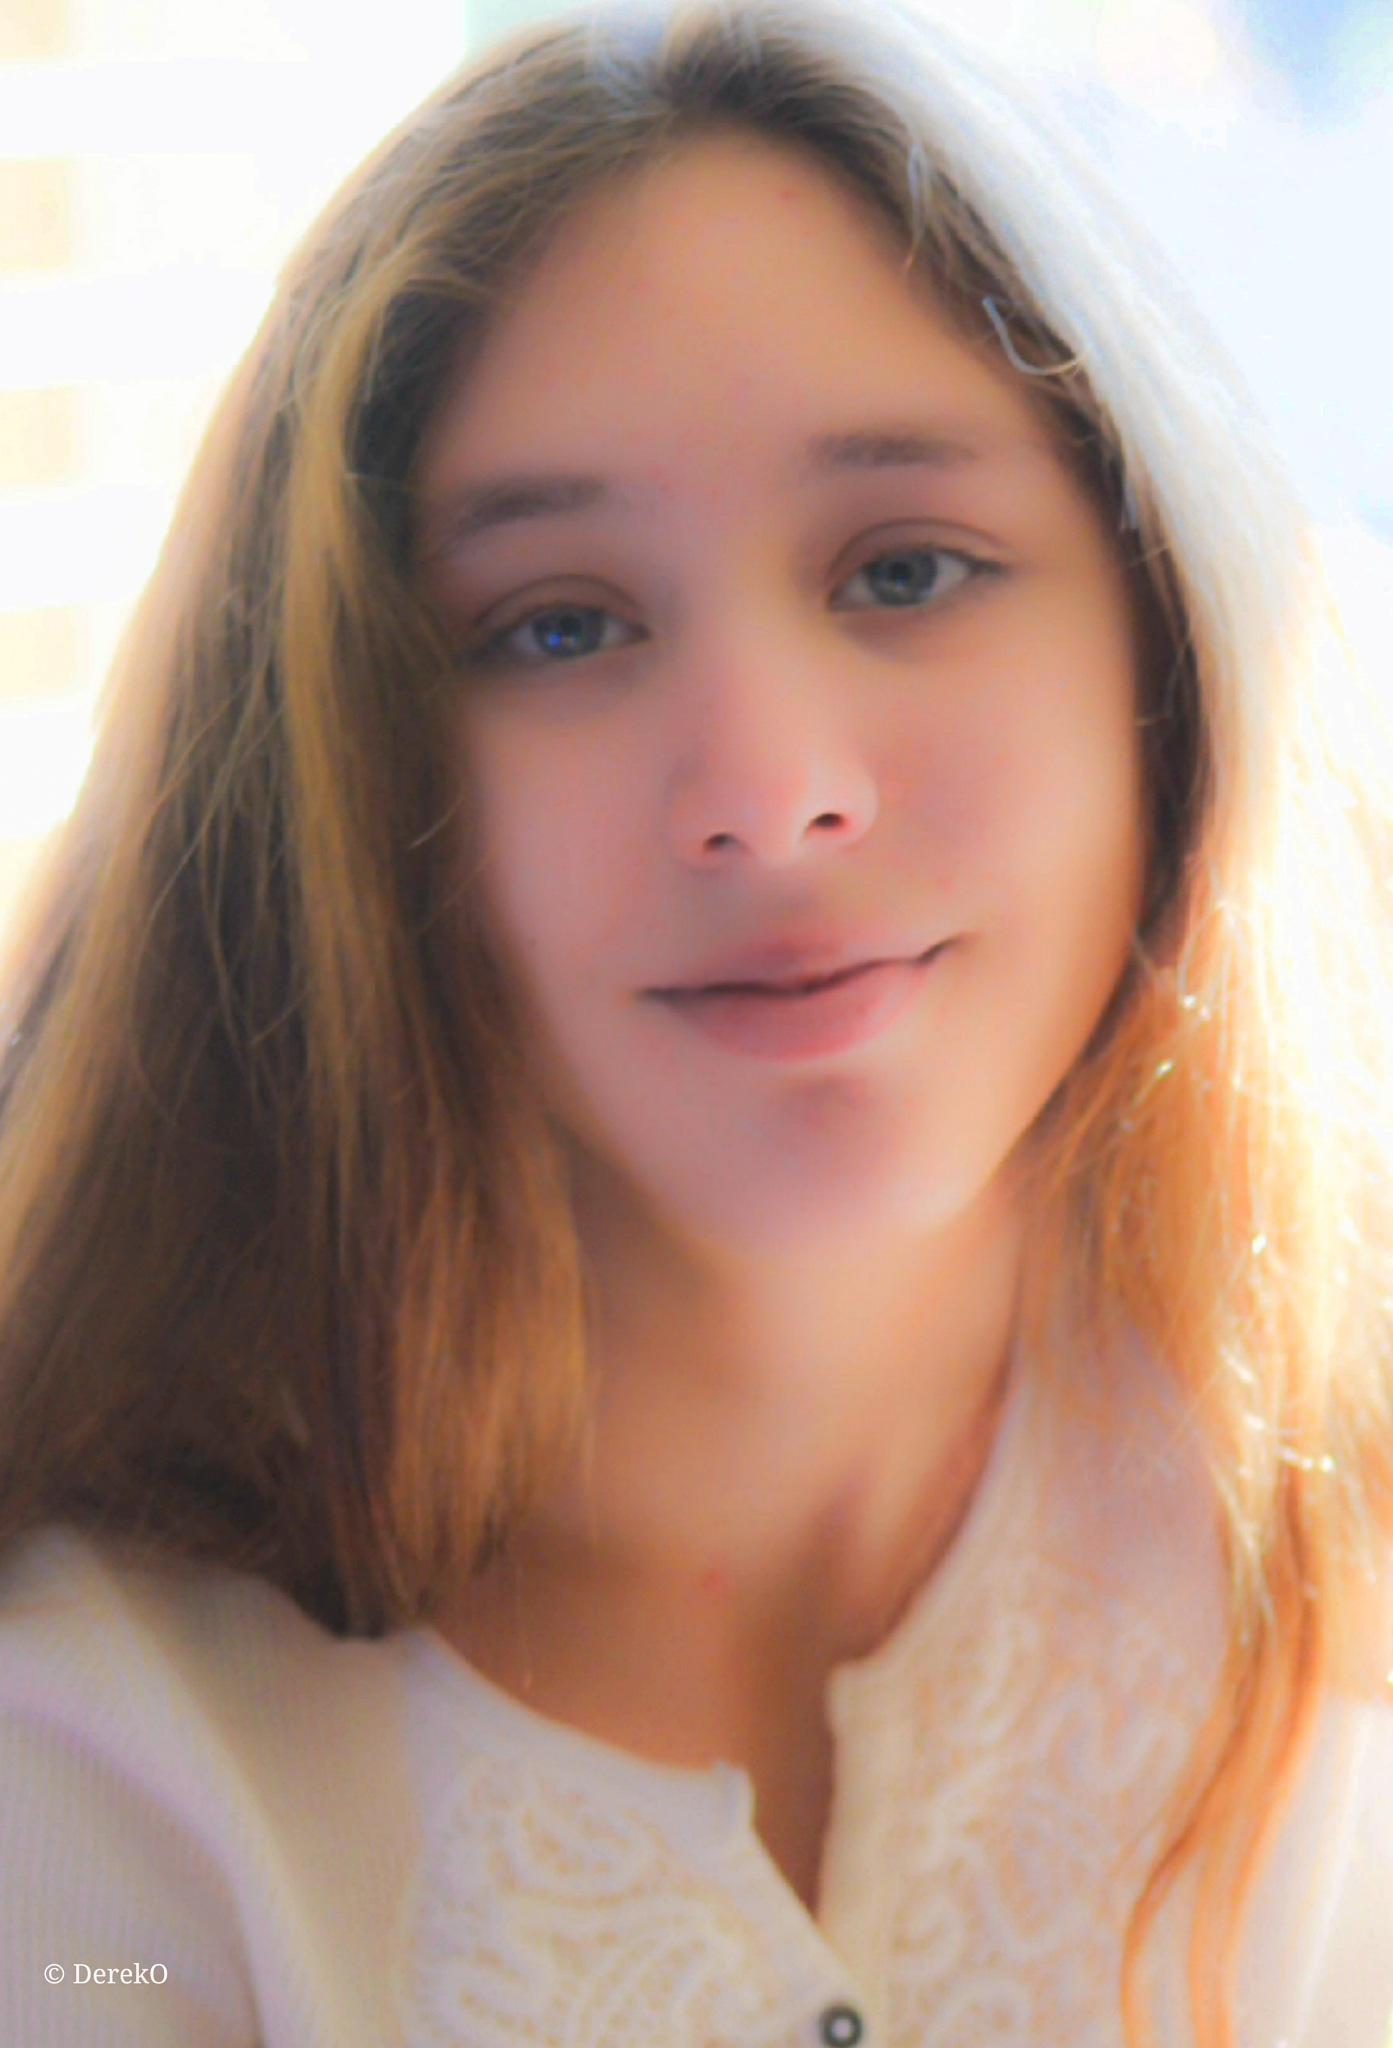 Photo in Portrait #dereko #derek oliver #khloe #light #child #girl #beautiful #blue #eyes #color #photography